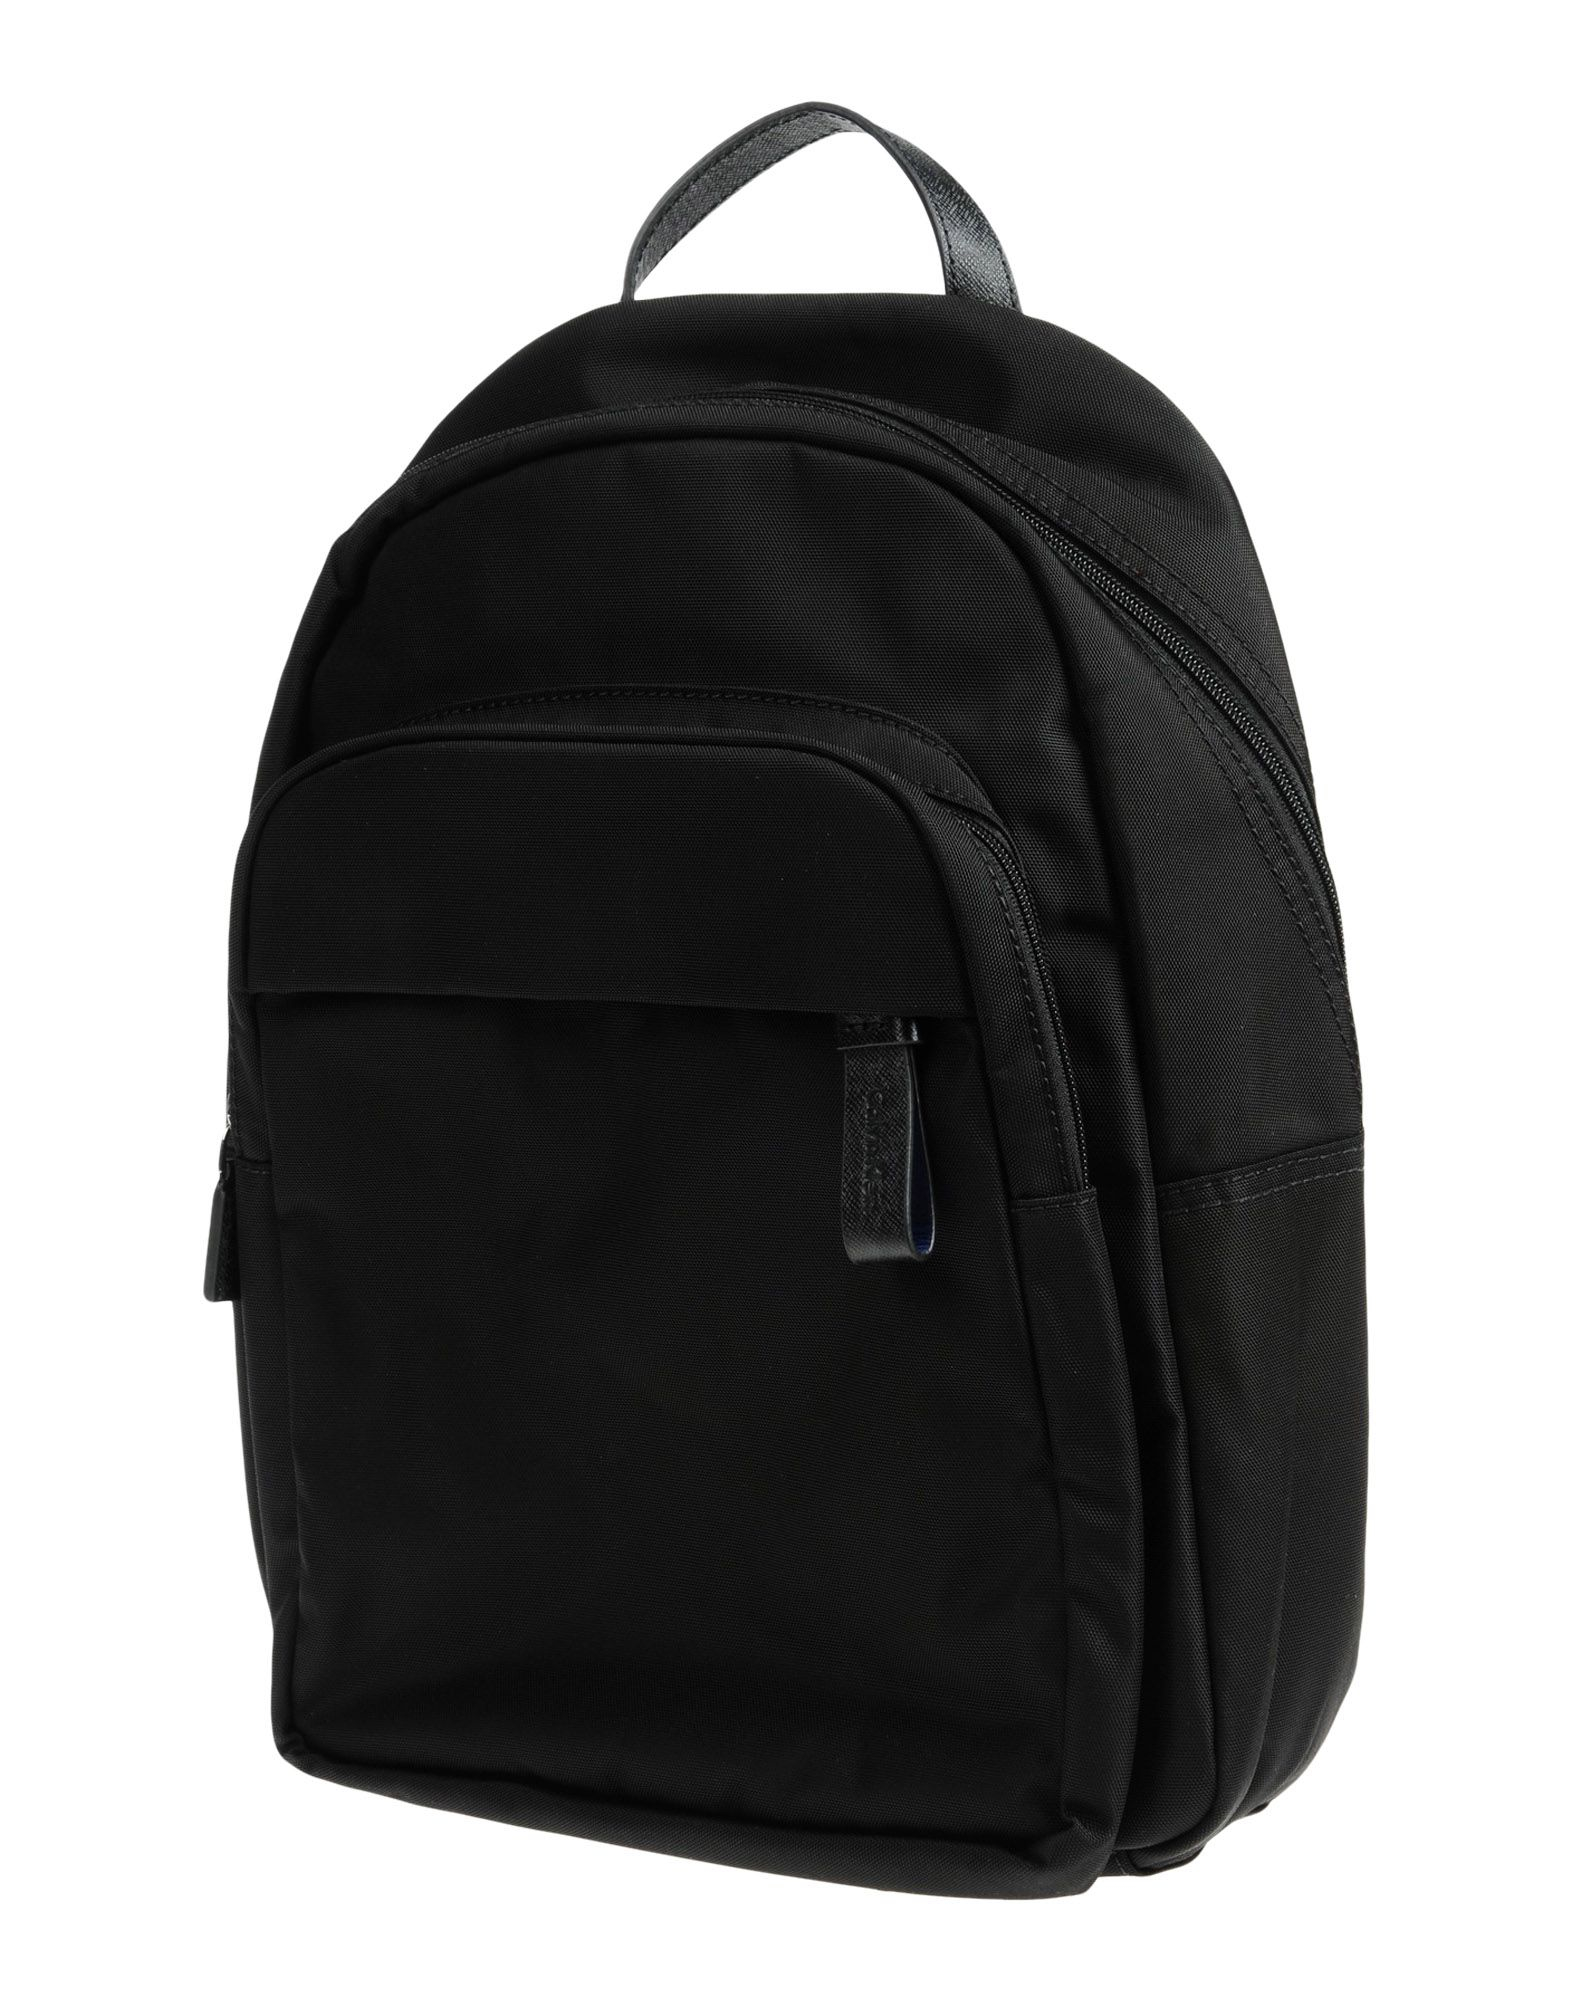 calvin klein rucksacks bumbags in black for men lyst. Black Bedroom Furniture Sets. Home Design Ideas